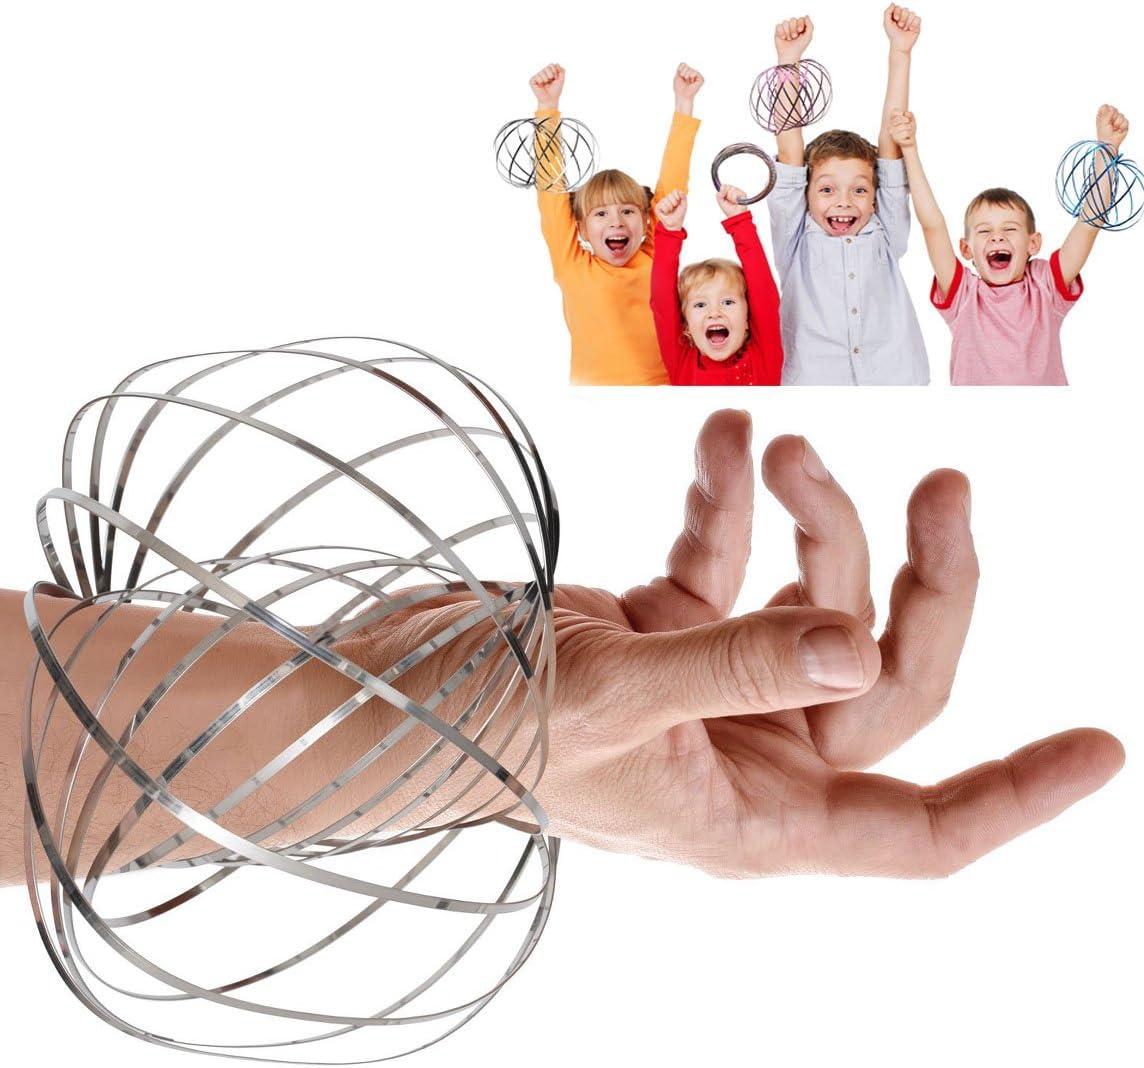 VNVDFLM Flow Ring Kinetic 3D Spring Magic Toy –Best Gifts for Kids